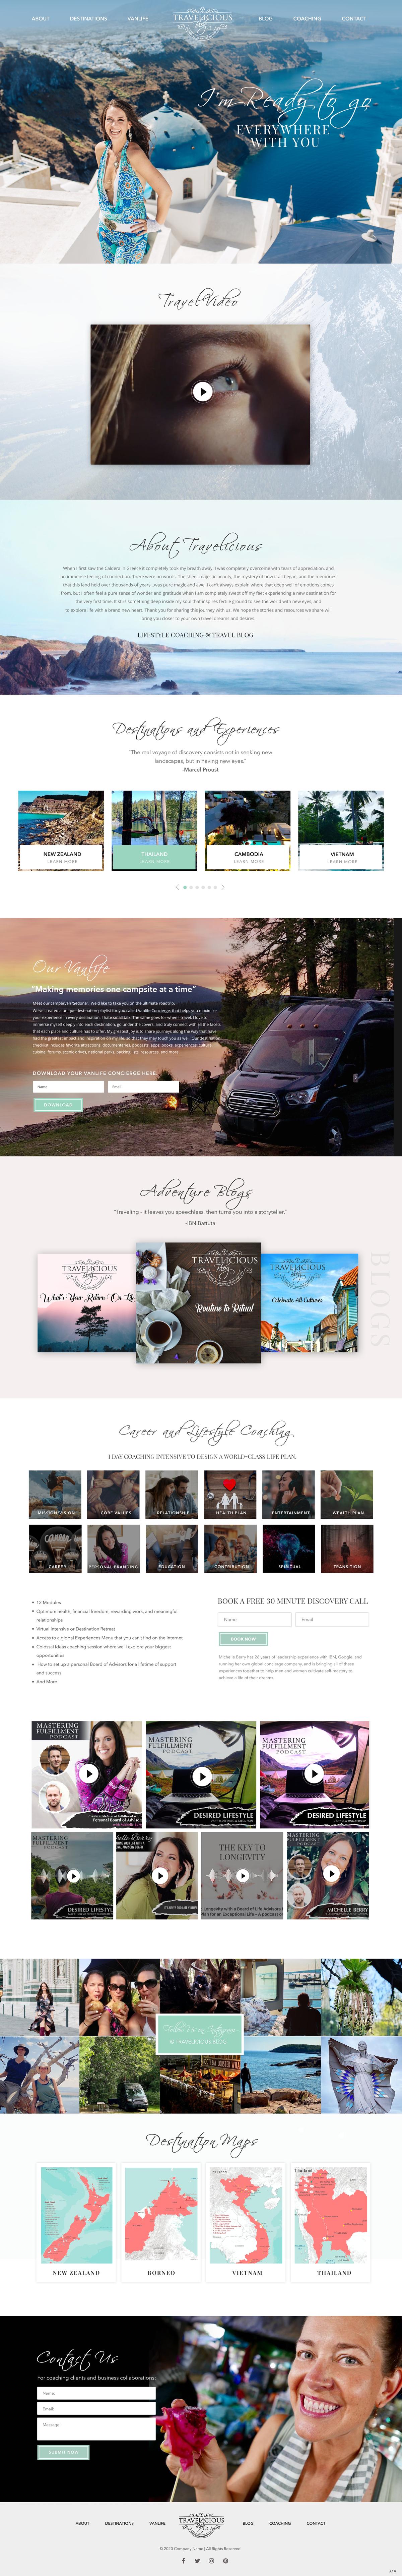 Travelicious Blog Website Design